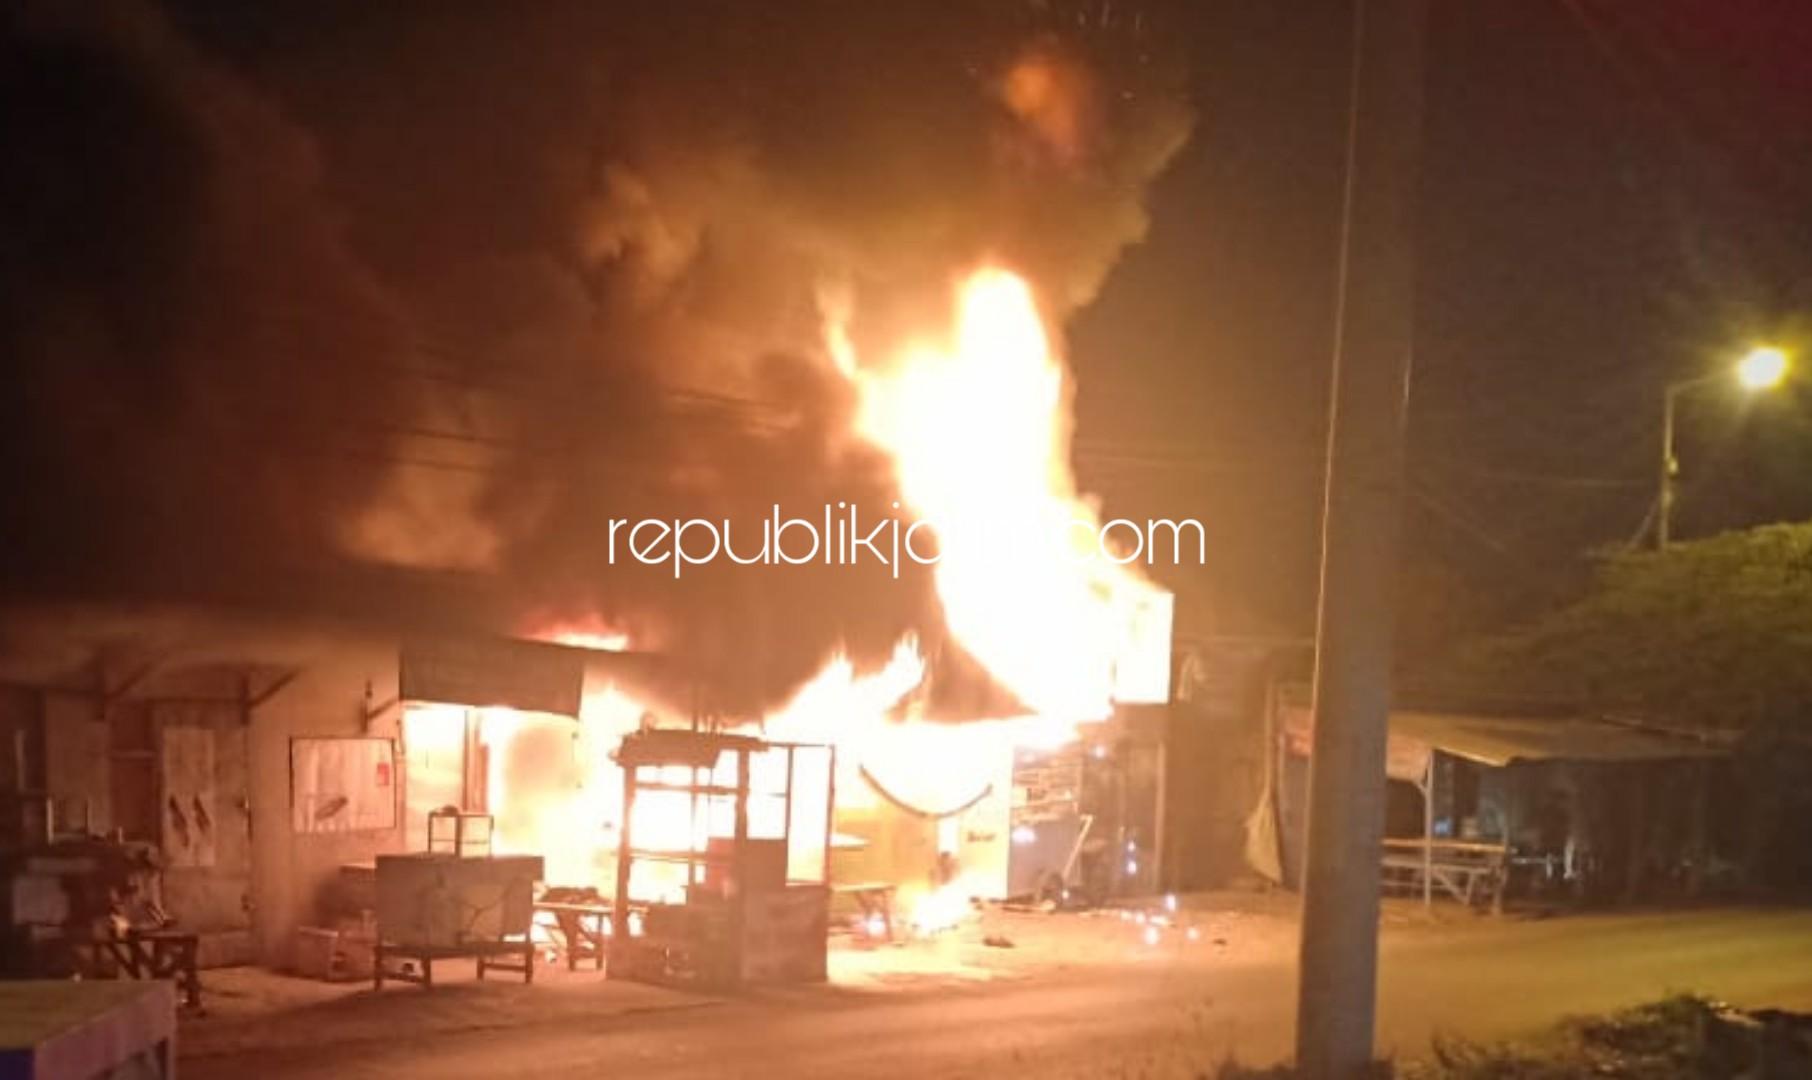 Usai Dengar Ledakan, Tiga Kios Warung di Gedangan Ludes Terbakar